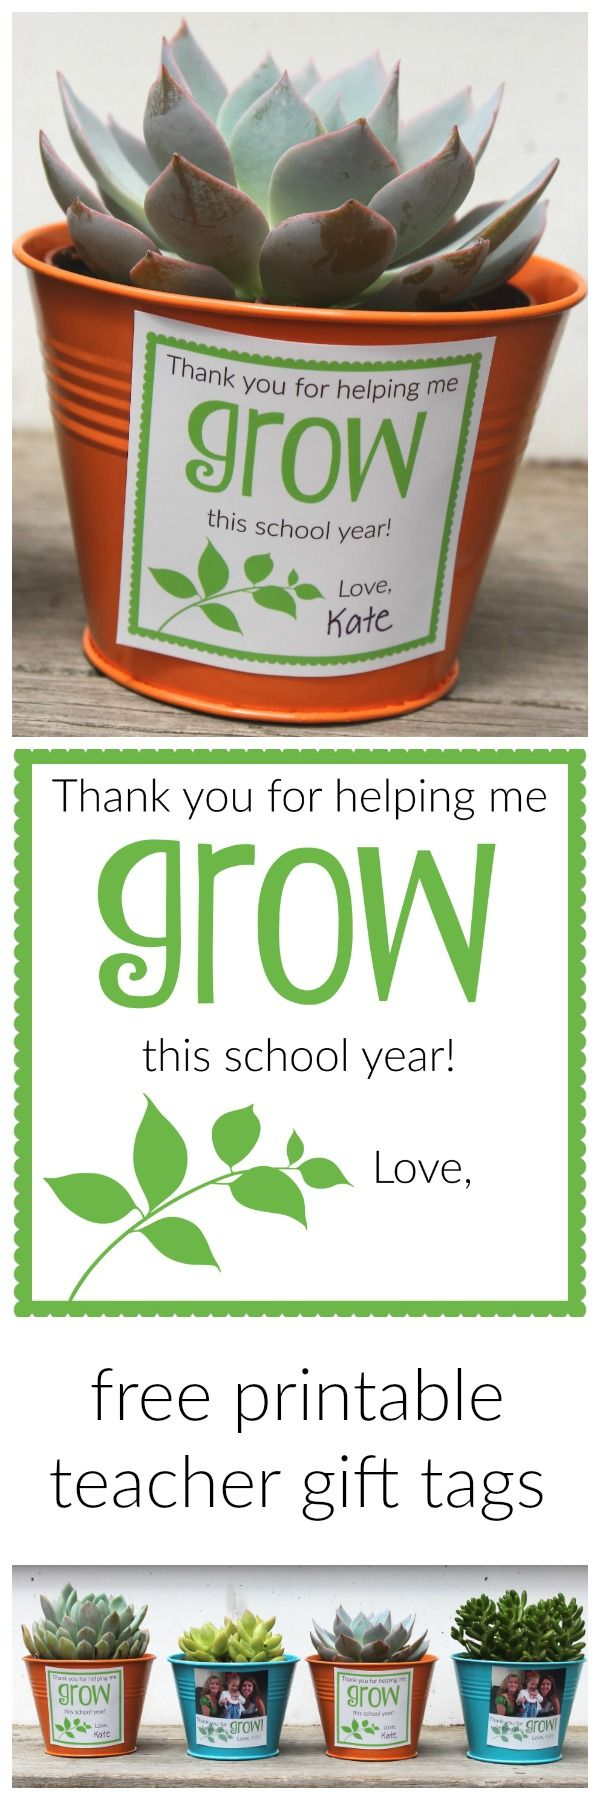 Thank You for Helping Me GROW // Free Printable Teacher Gift Tags